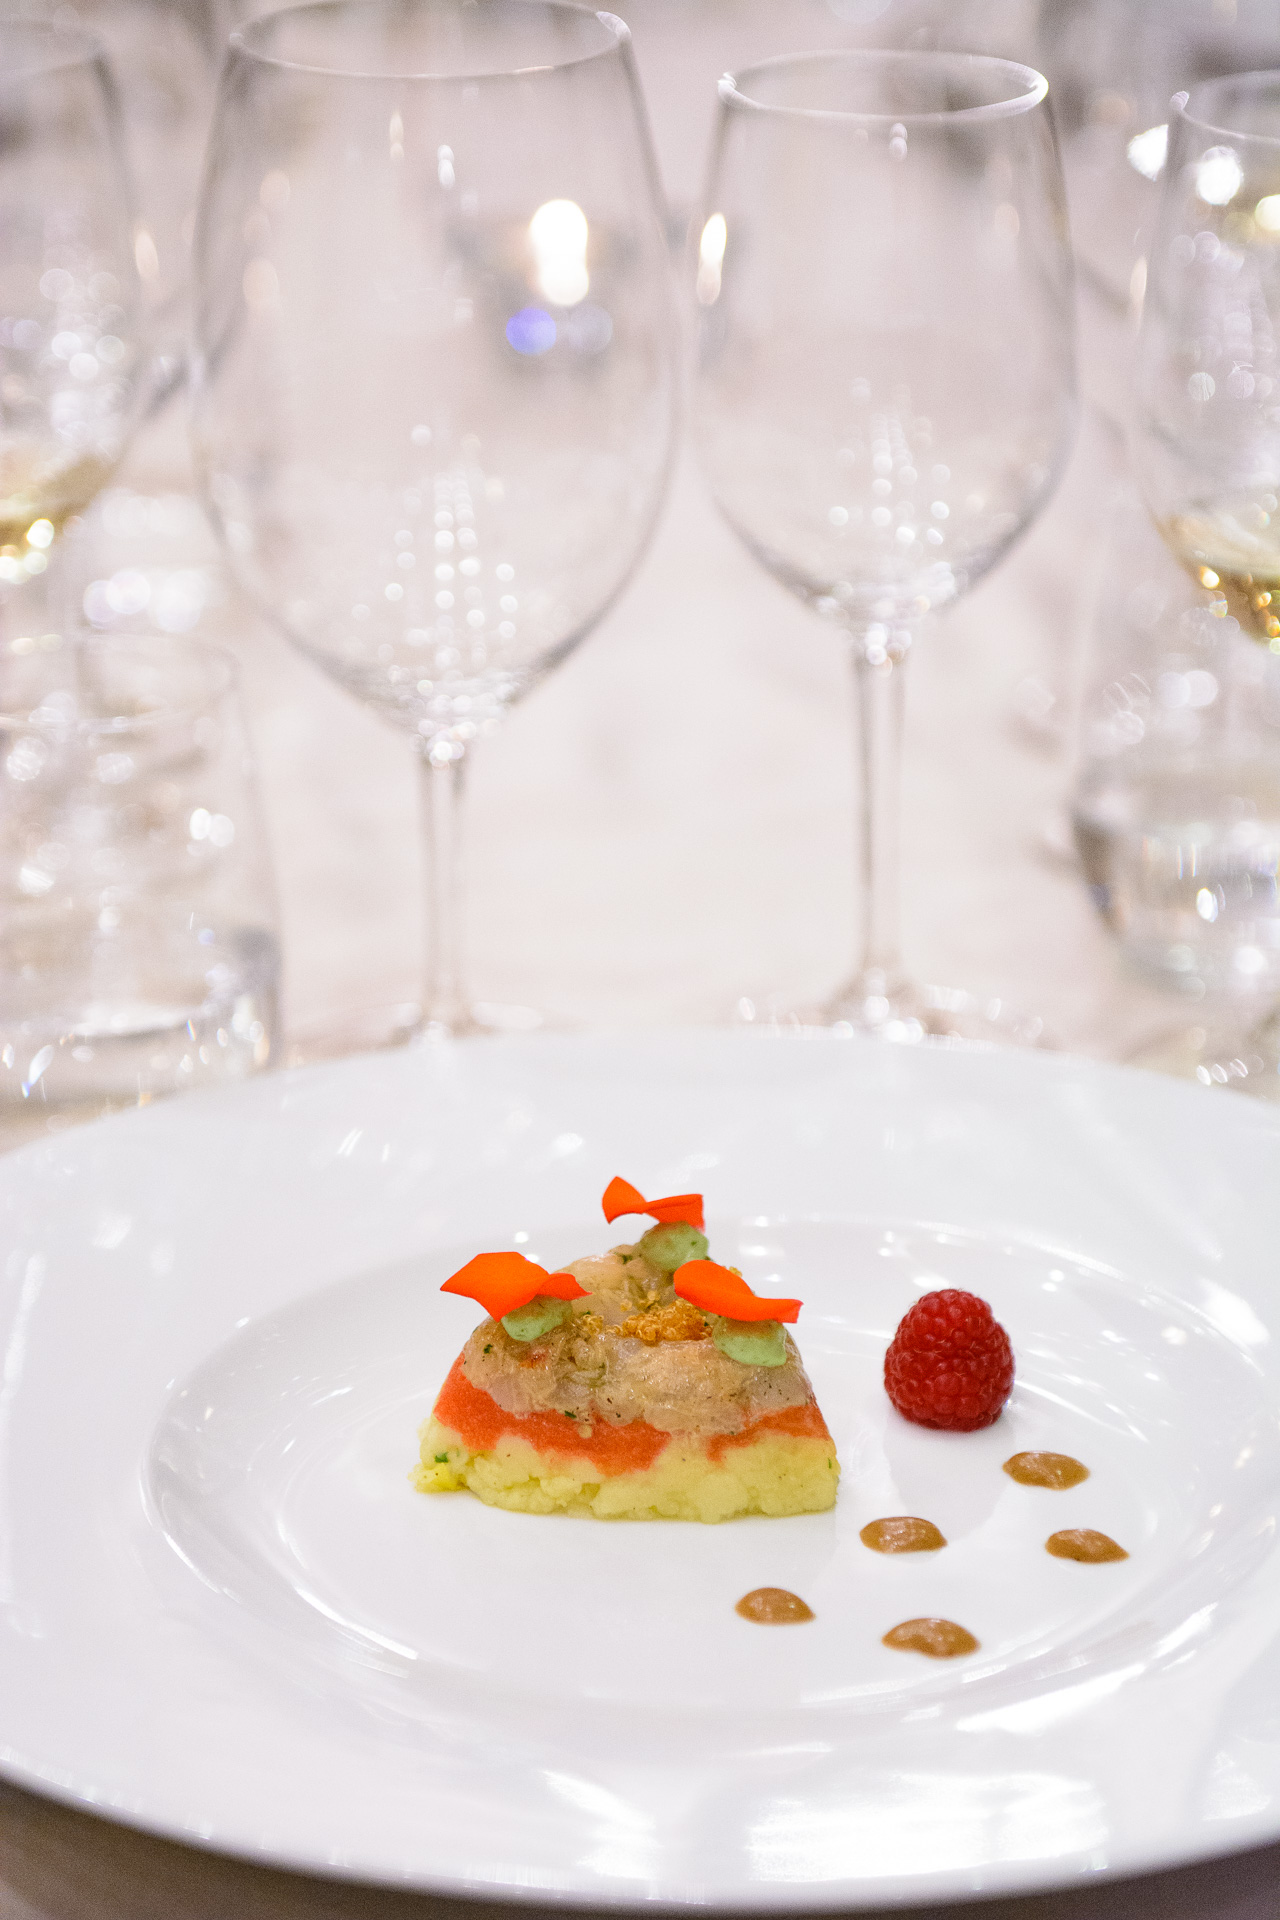 Dish by Chef Jordi Esteve 5th Premier gastronomy festival